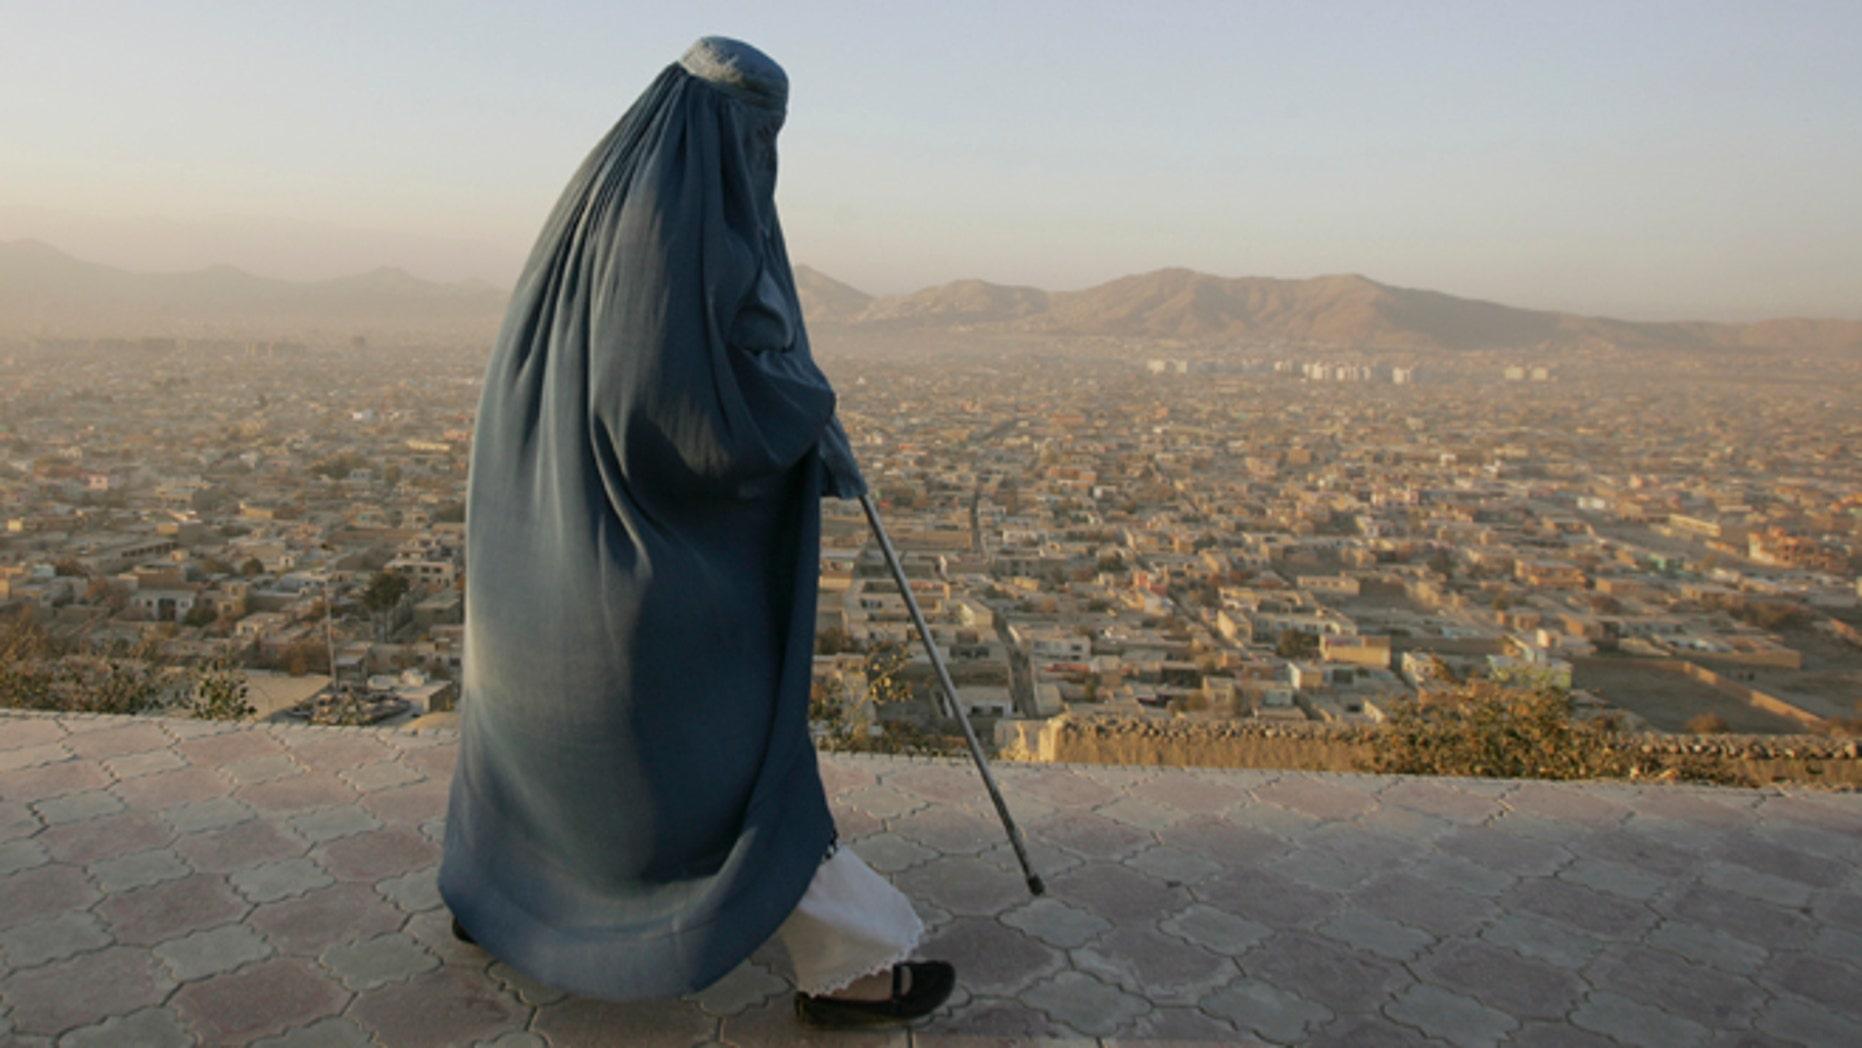 Nov. 11, 2012: An Afghan woman walks on a hill overlooking Kabul, Afghanistan.